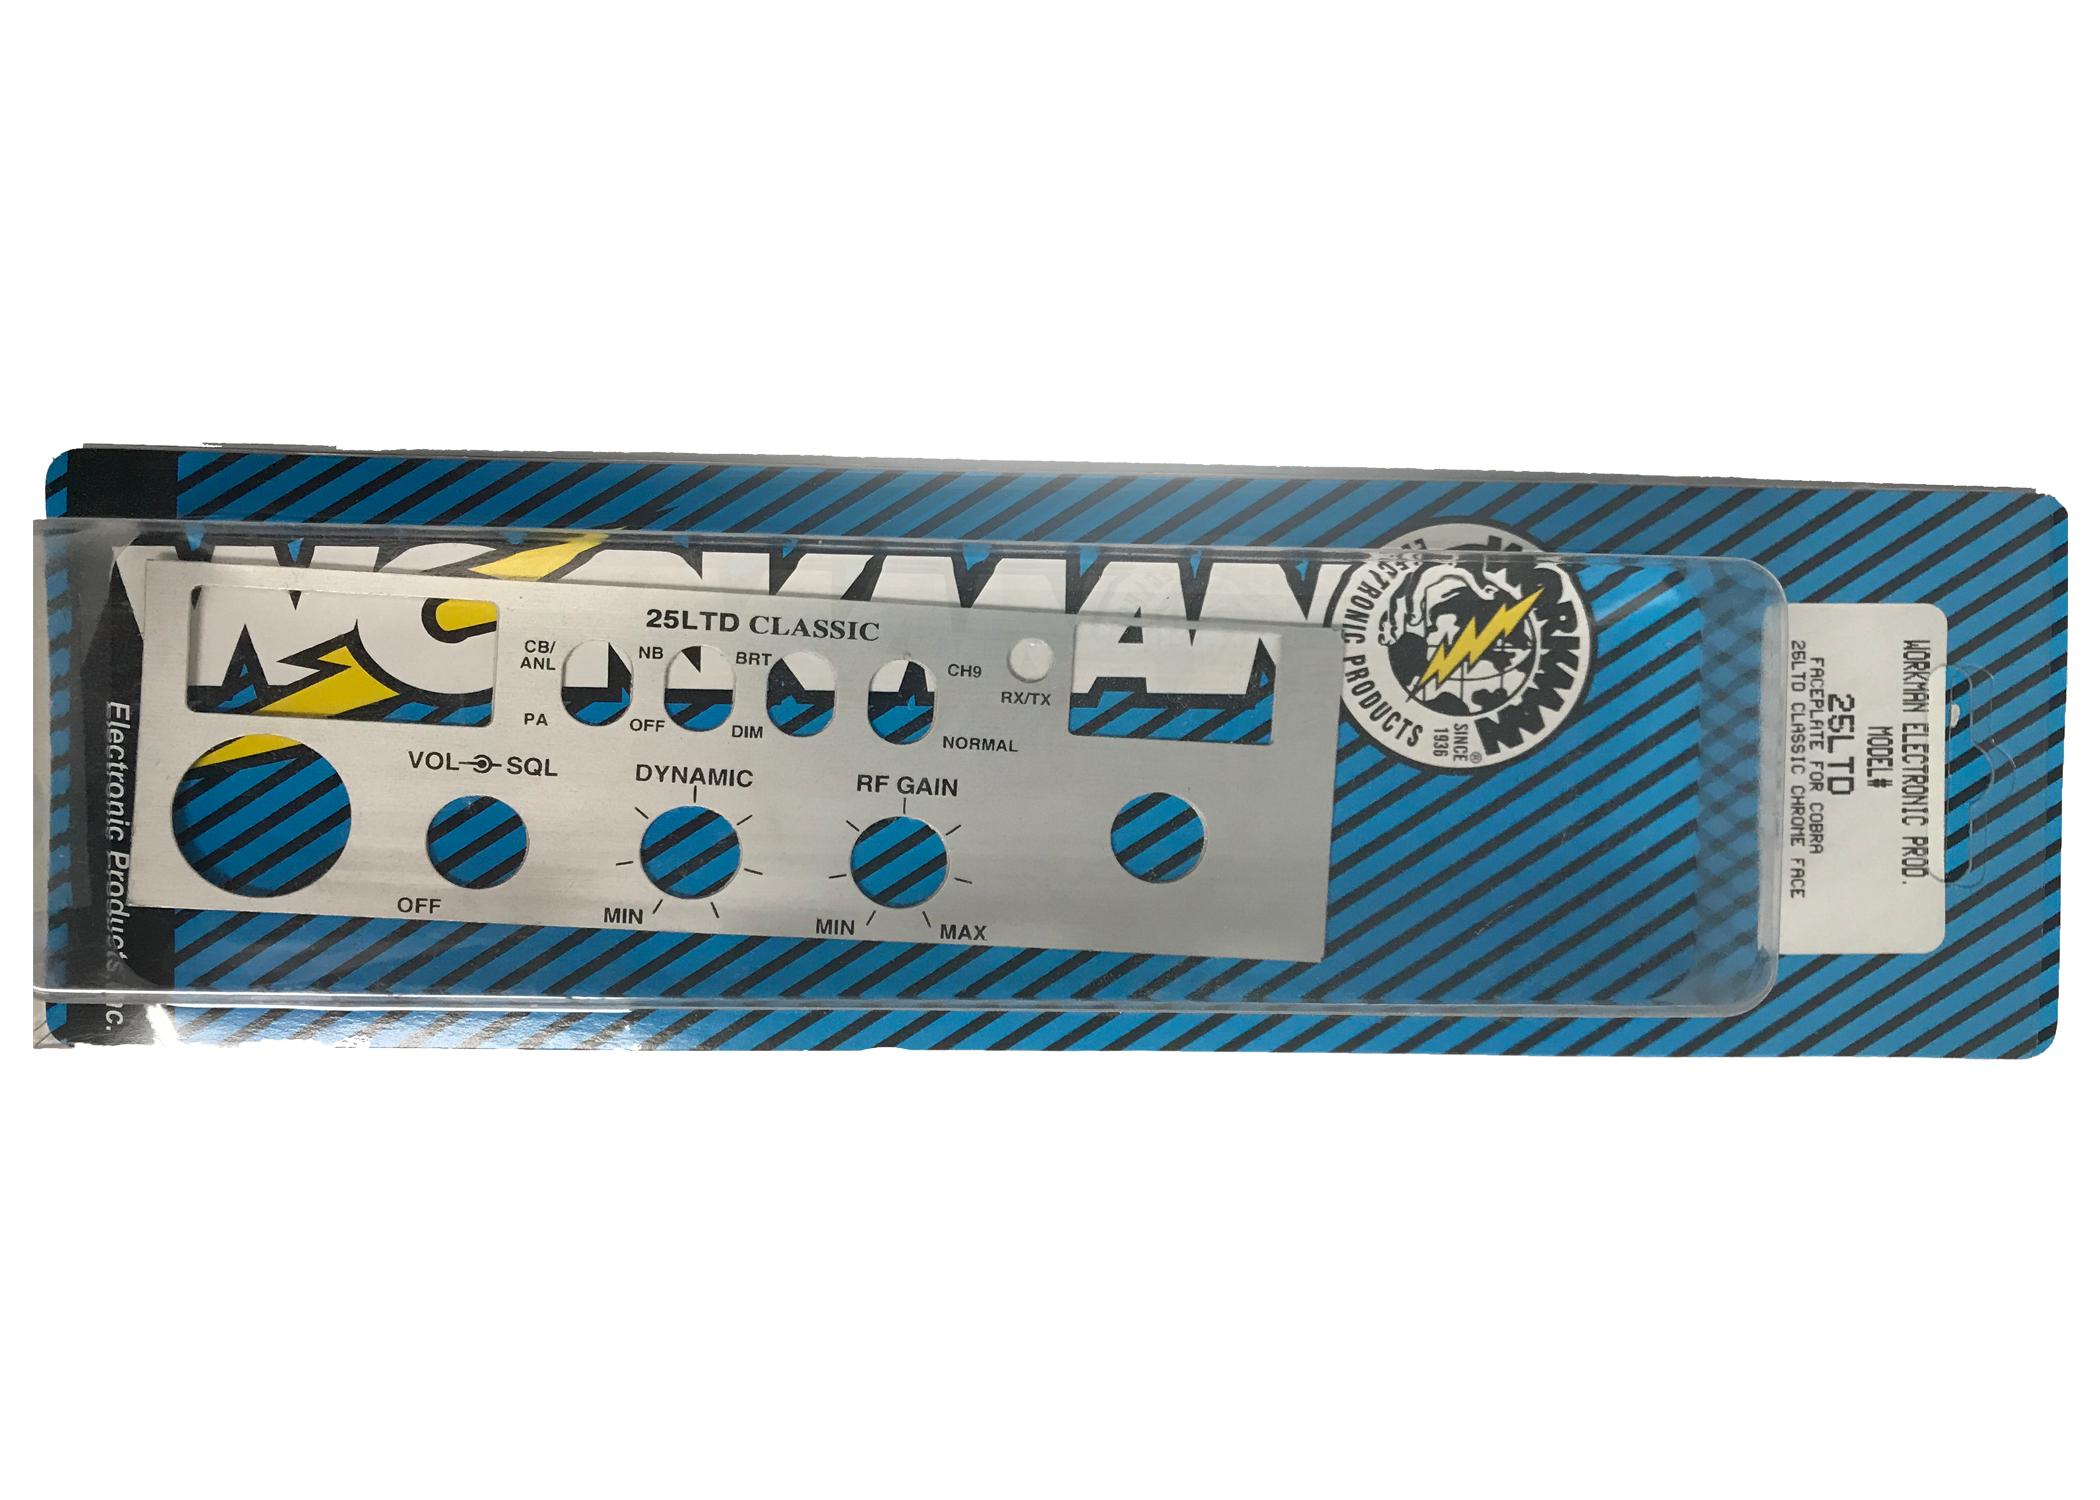 25CHROME - Chrome Face Plate For The C25LTD Radio